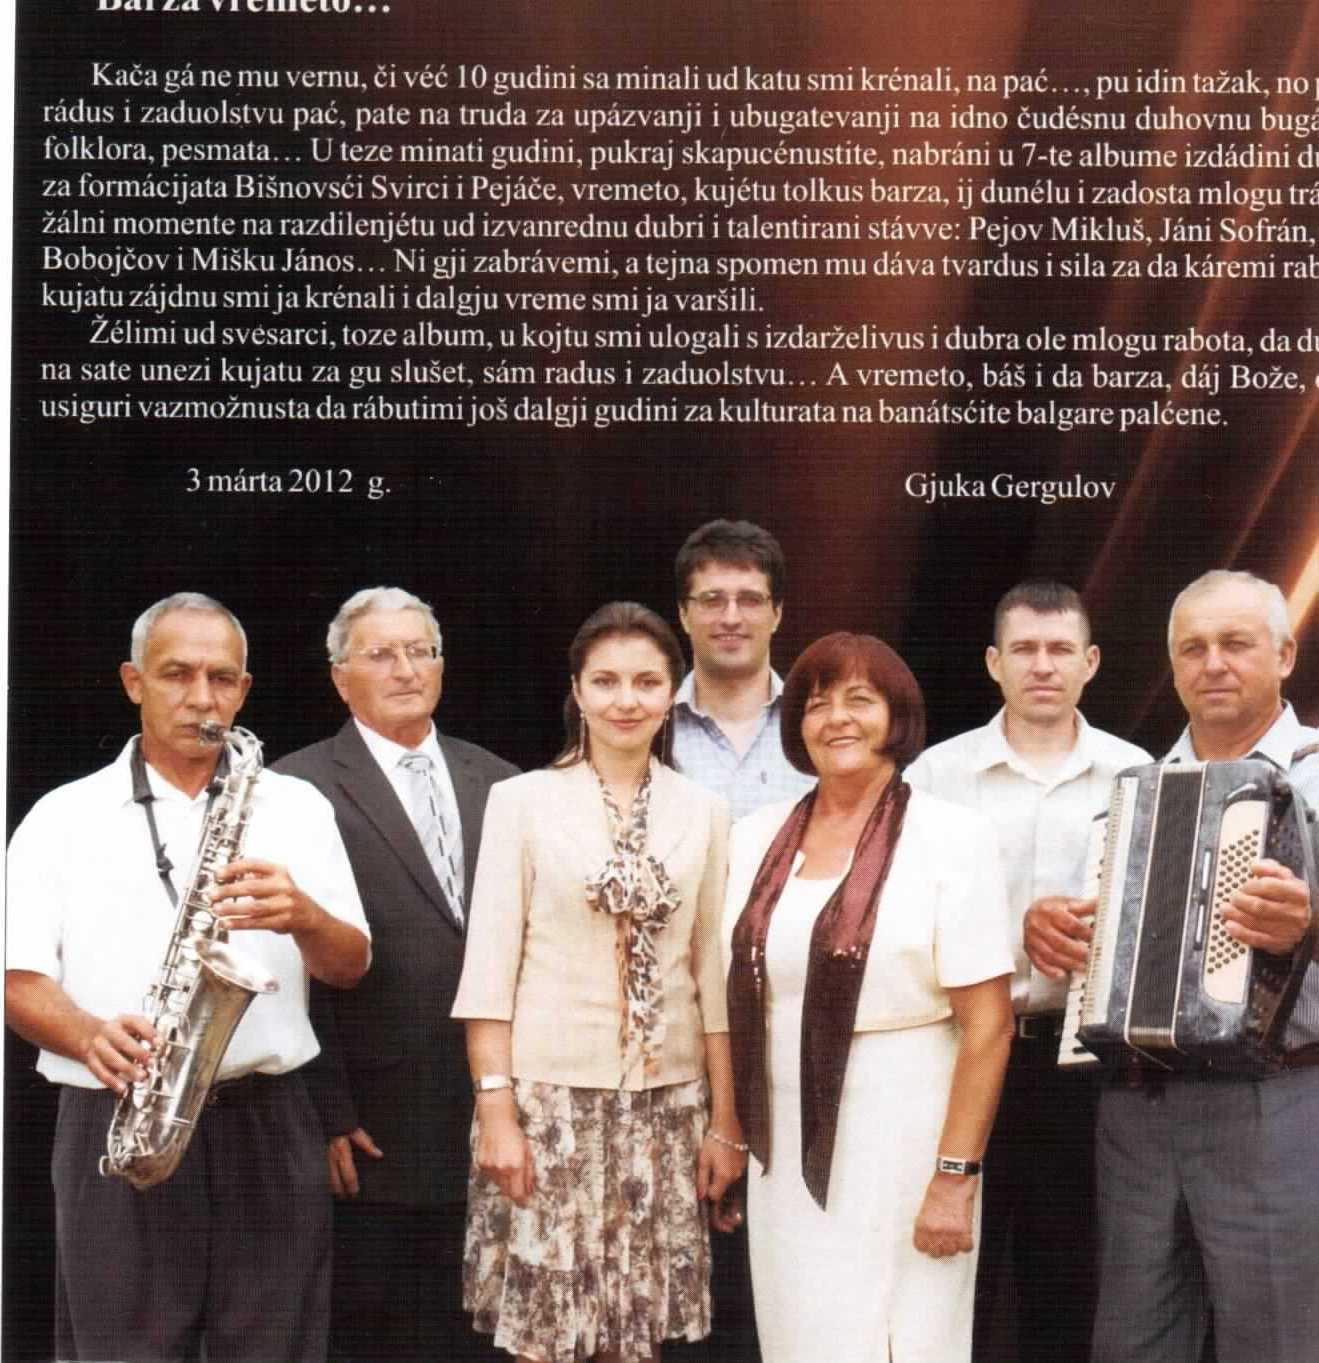 Asociatia culturala bulgara Dudestii Vechi – B. S. P. - Bisnovsci Svirci i Pejace